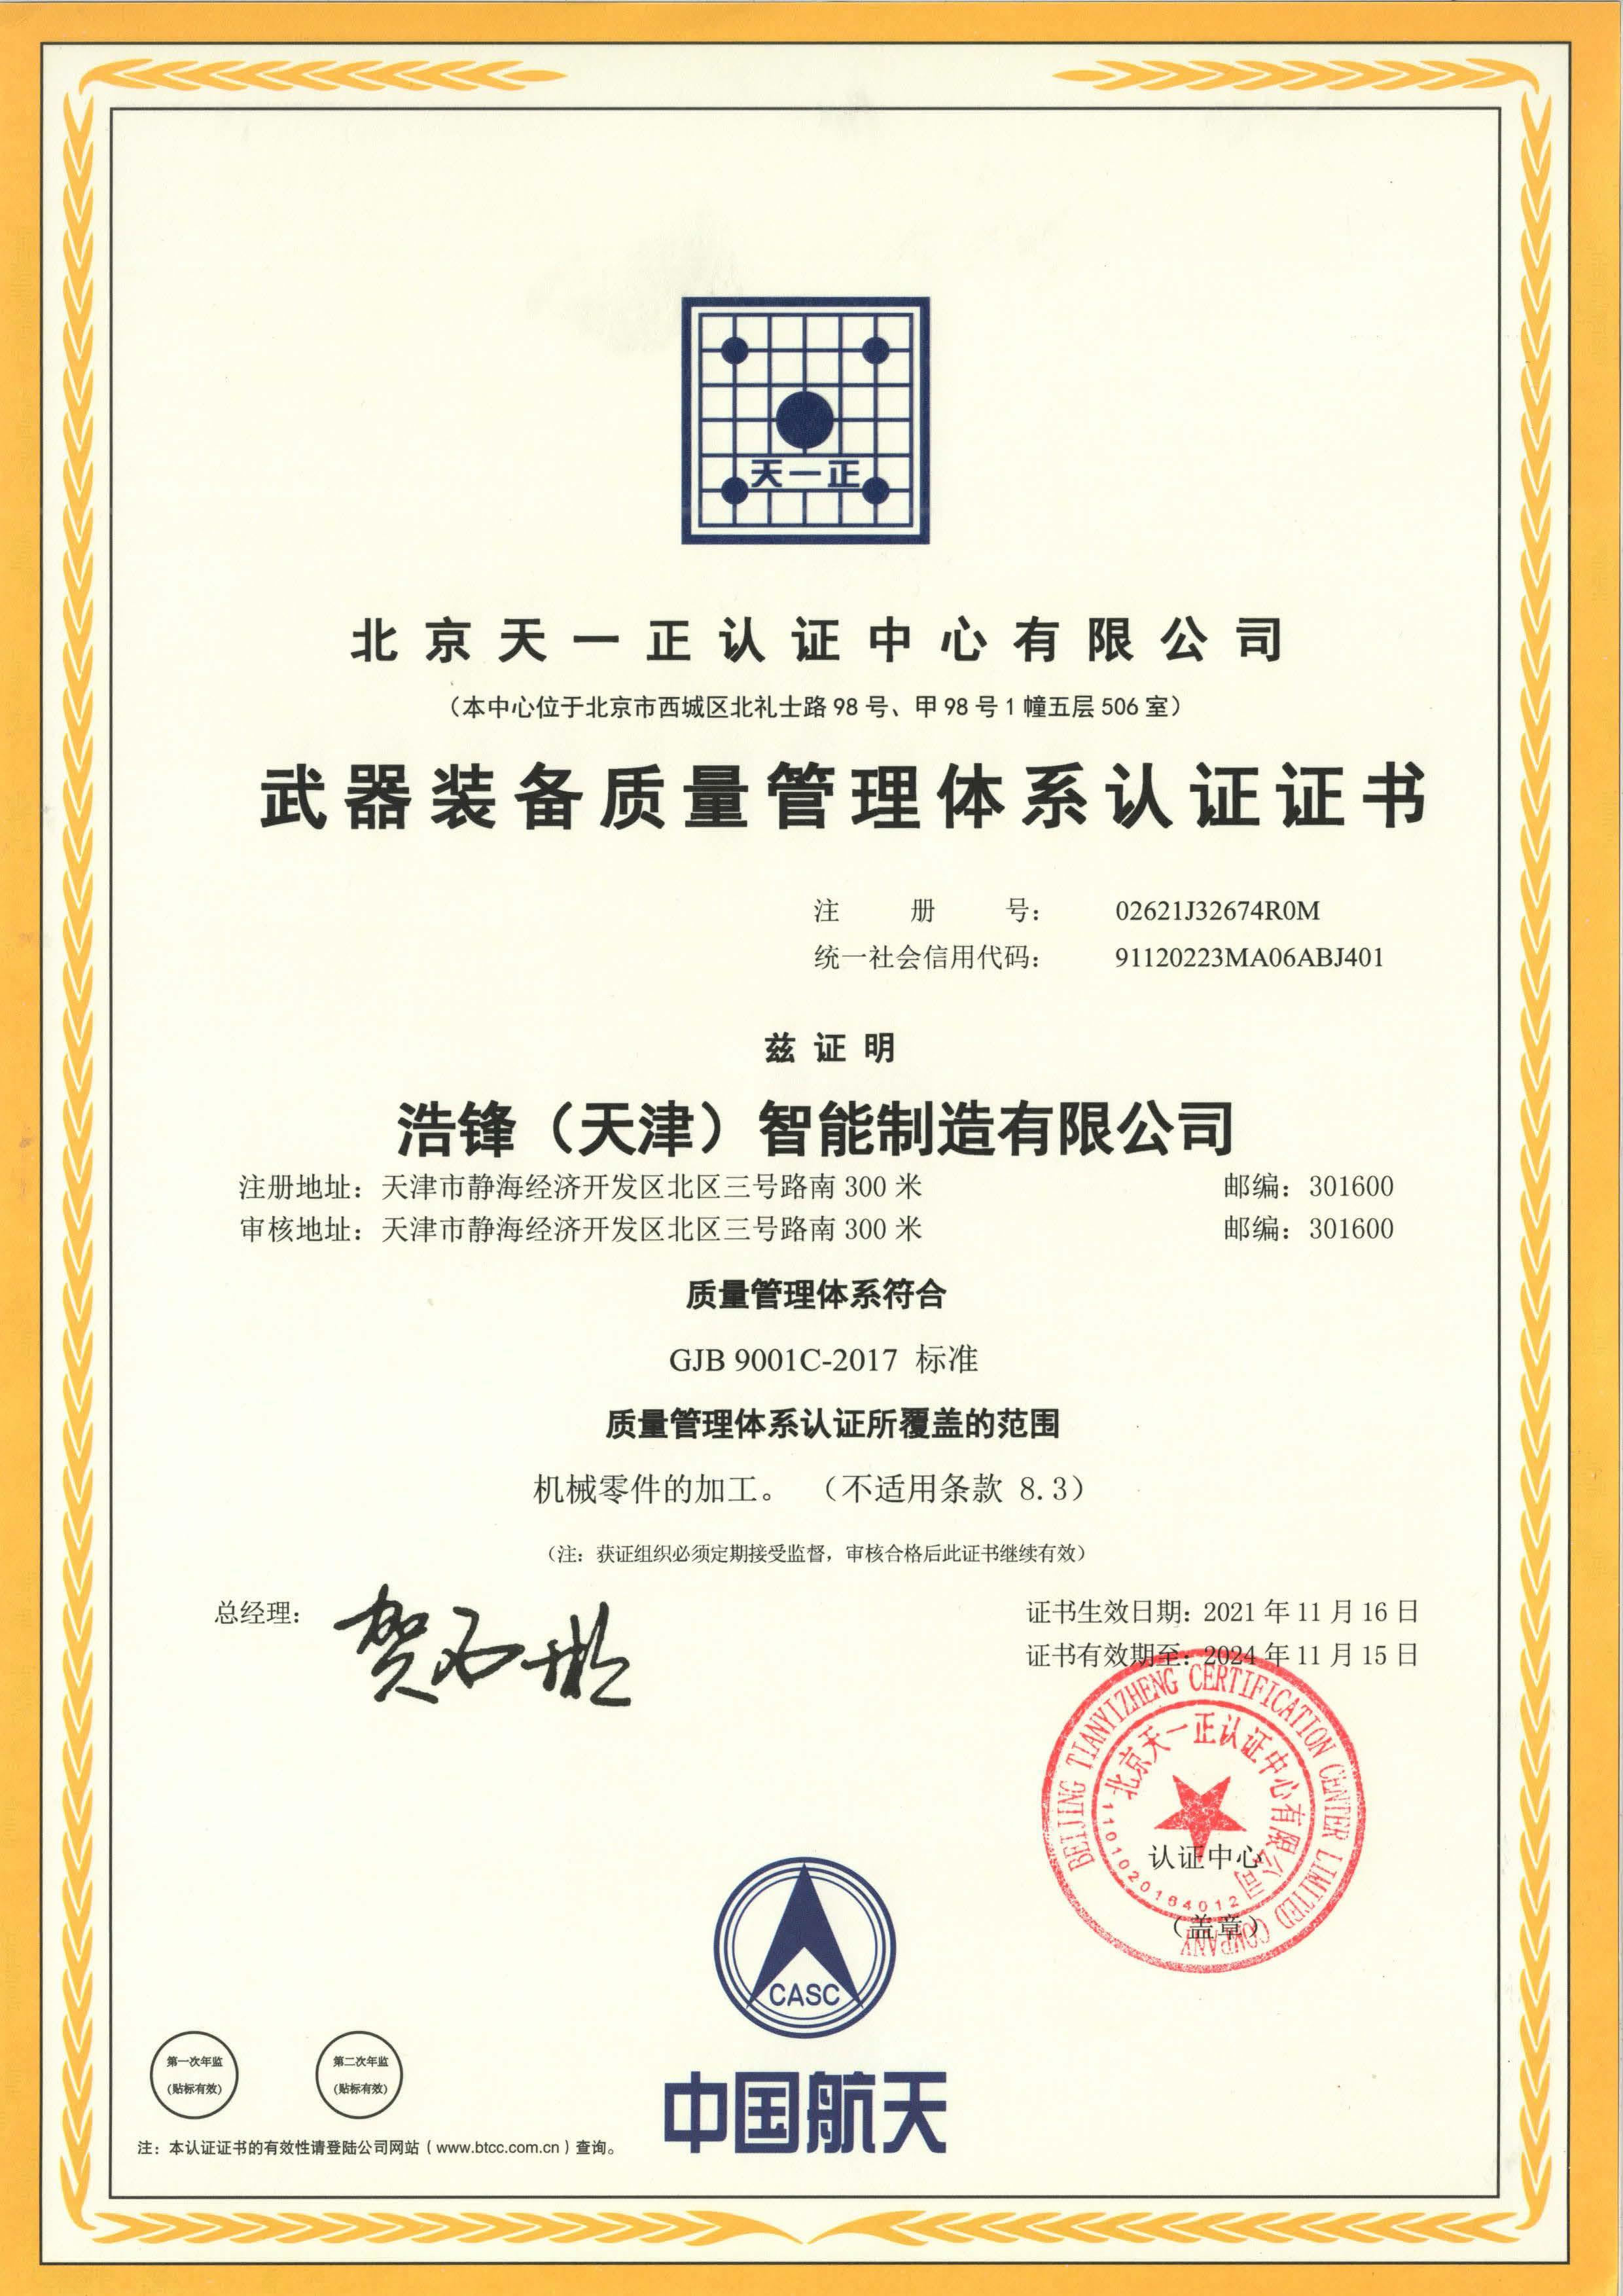 UKAS 雄伟ISO9001管理体系证书-中文